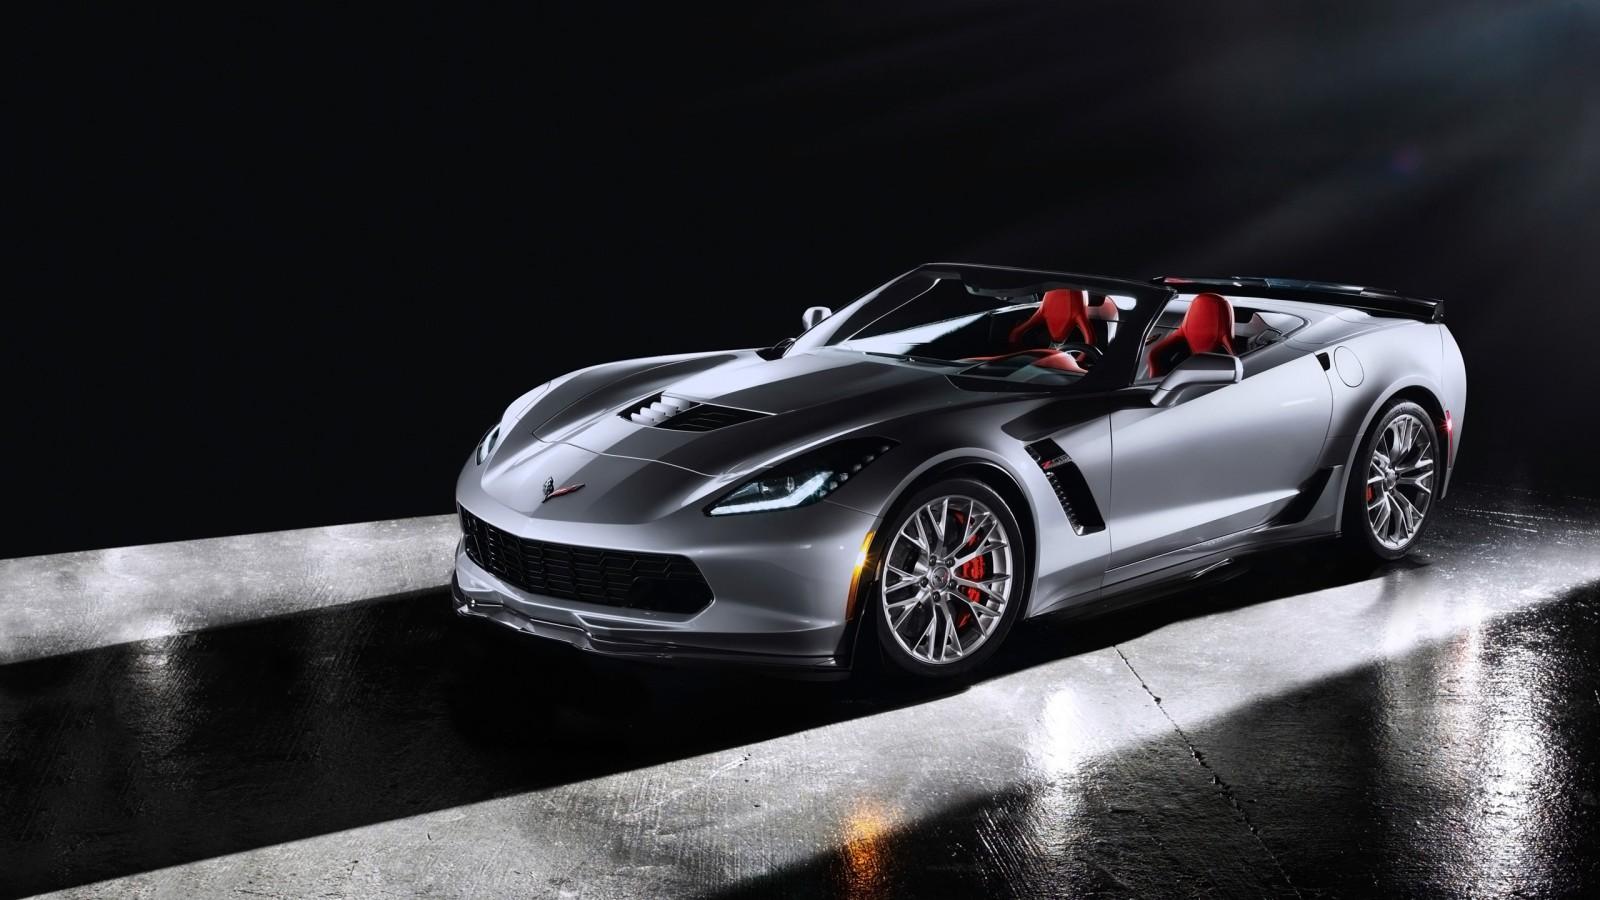 2015 chevrolet corvette z06 convertible 3 wallpaper hd car. Black Bedroom Furniture Sets. Home Design Ideas